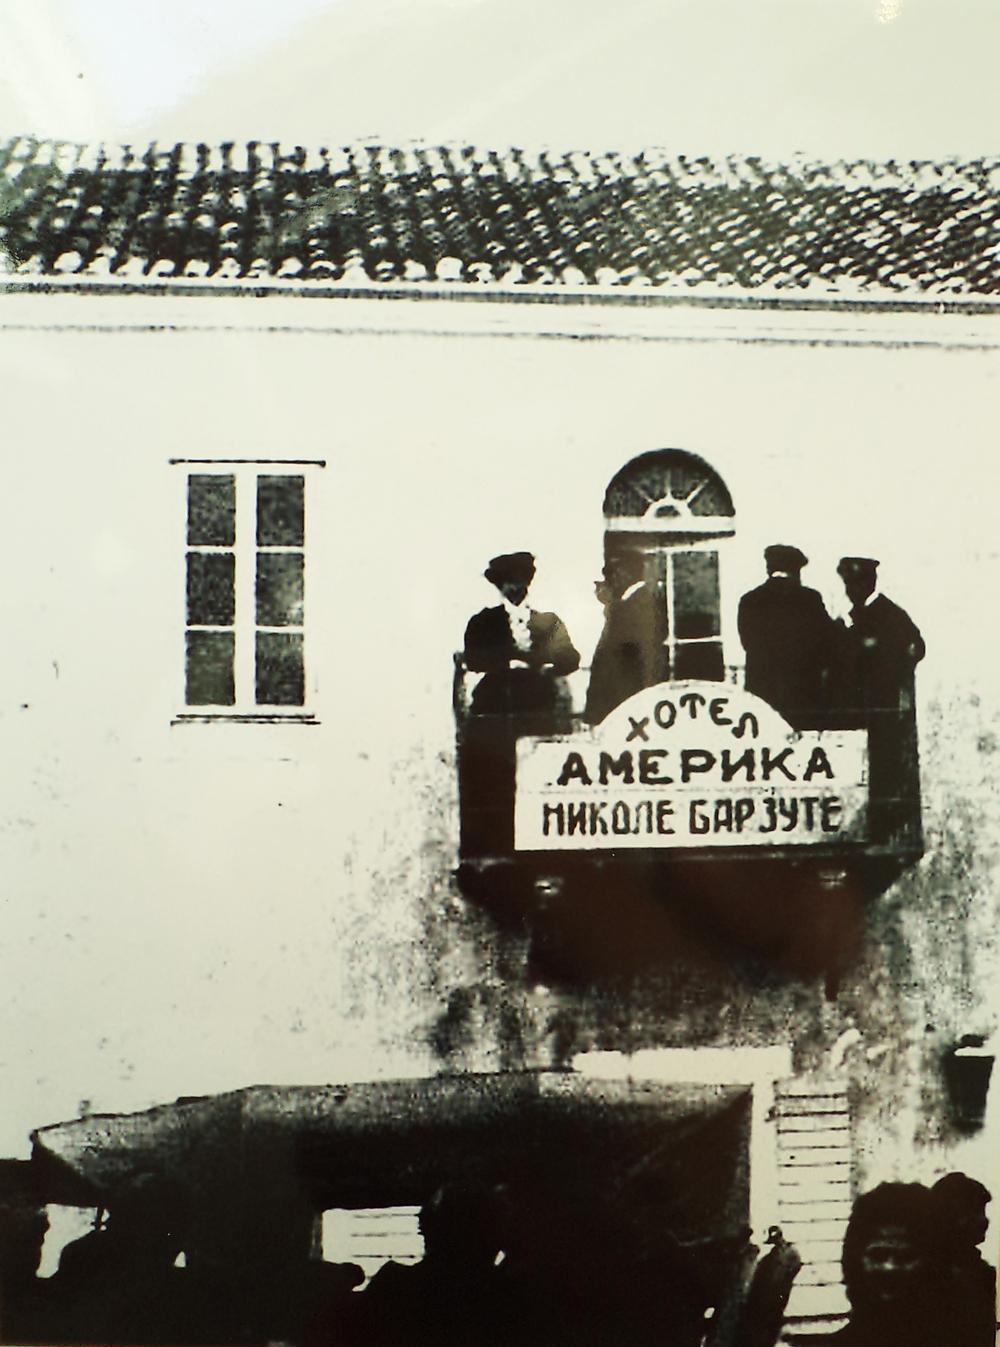 Novine-Hotel Amerika1